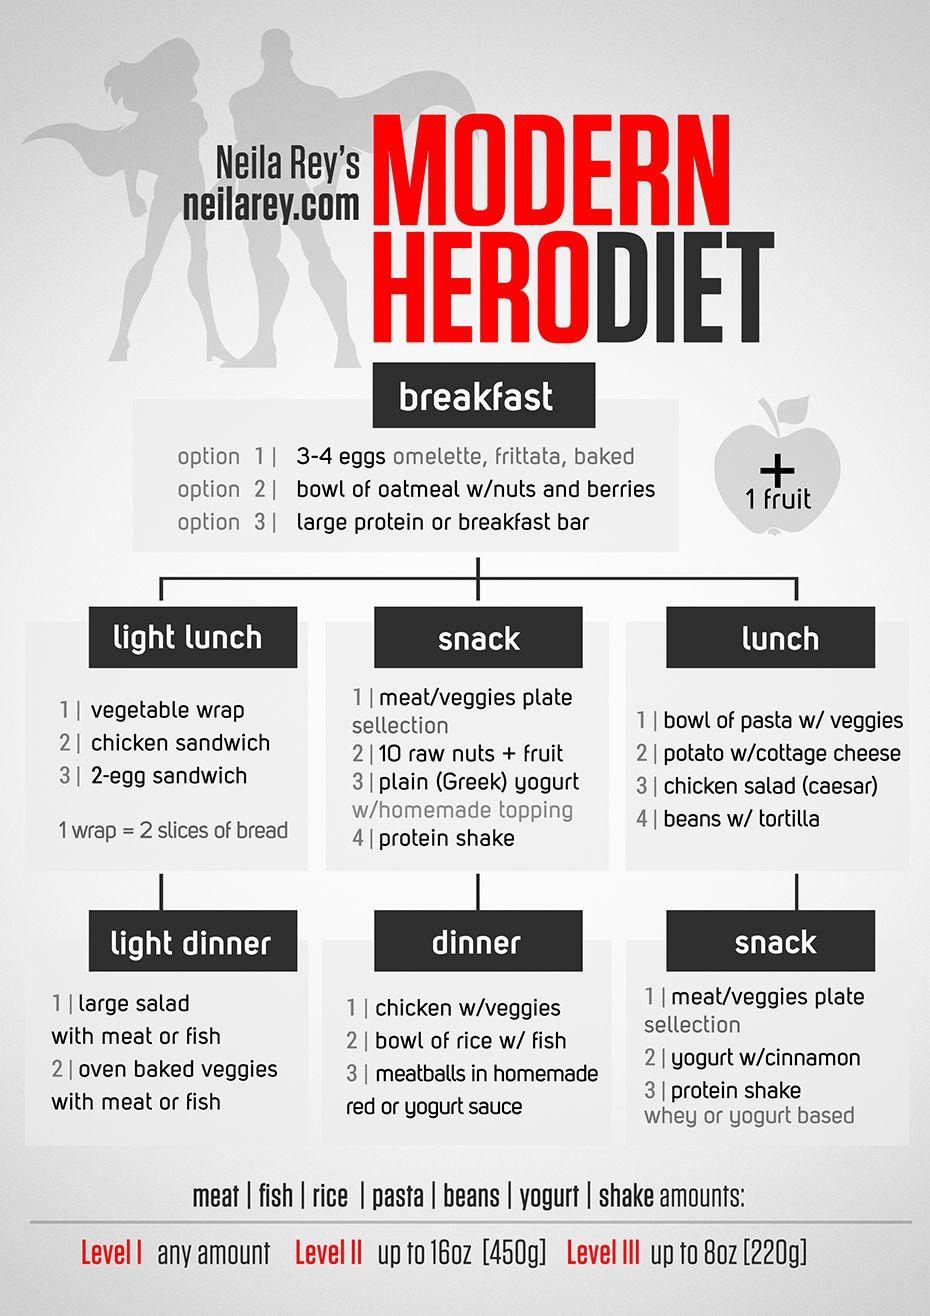 Modern Hero Diet Infographic